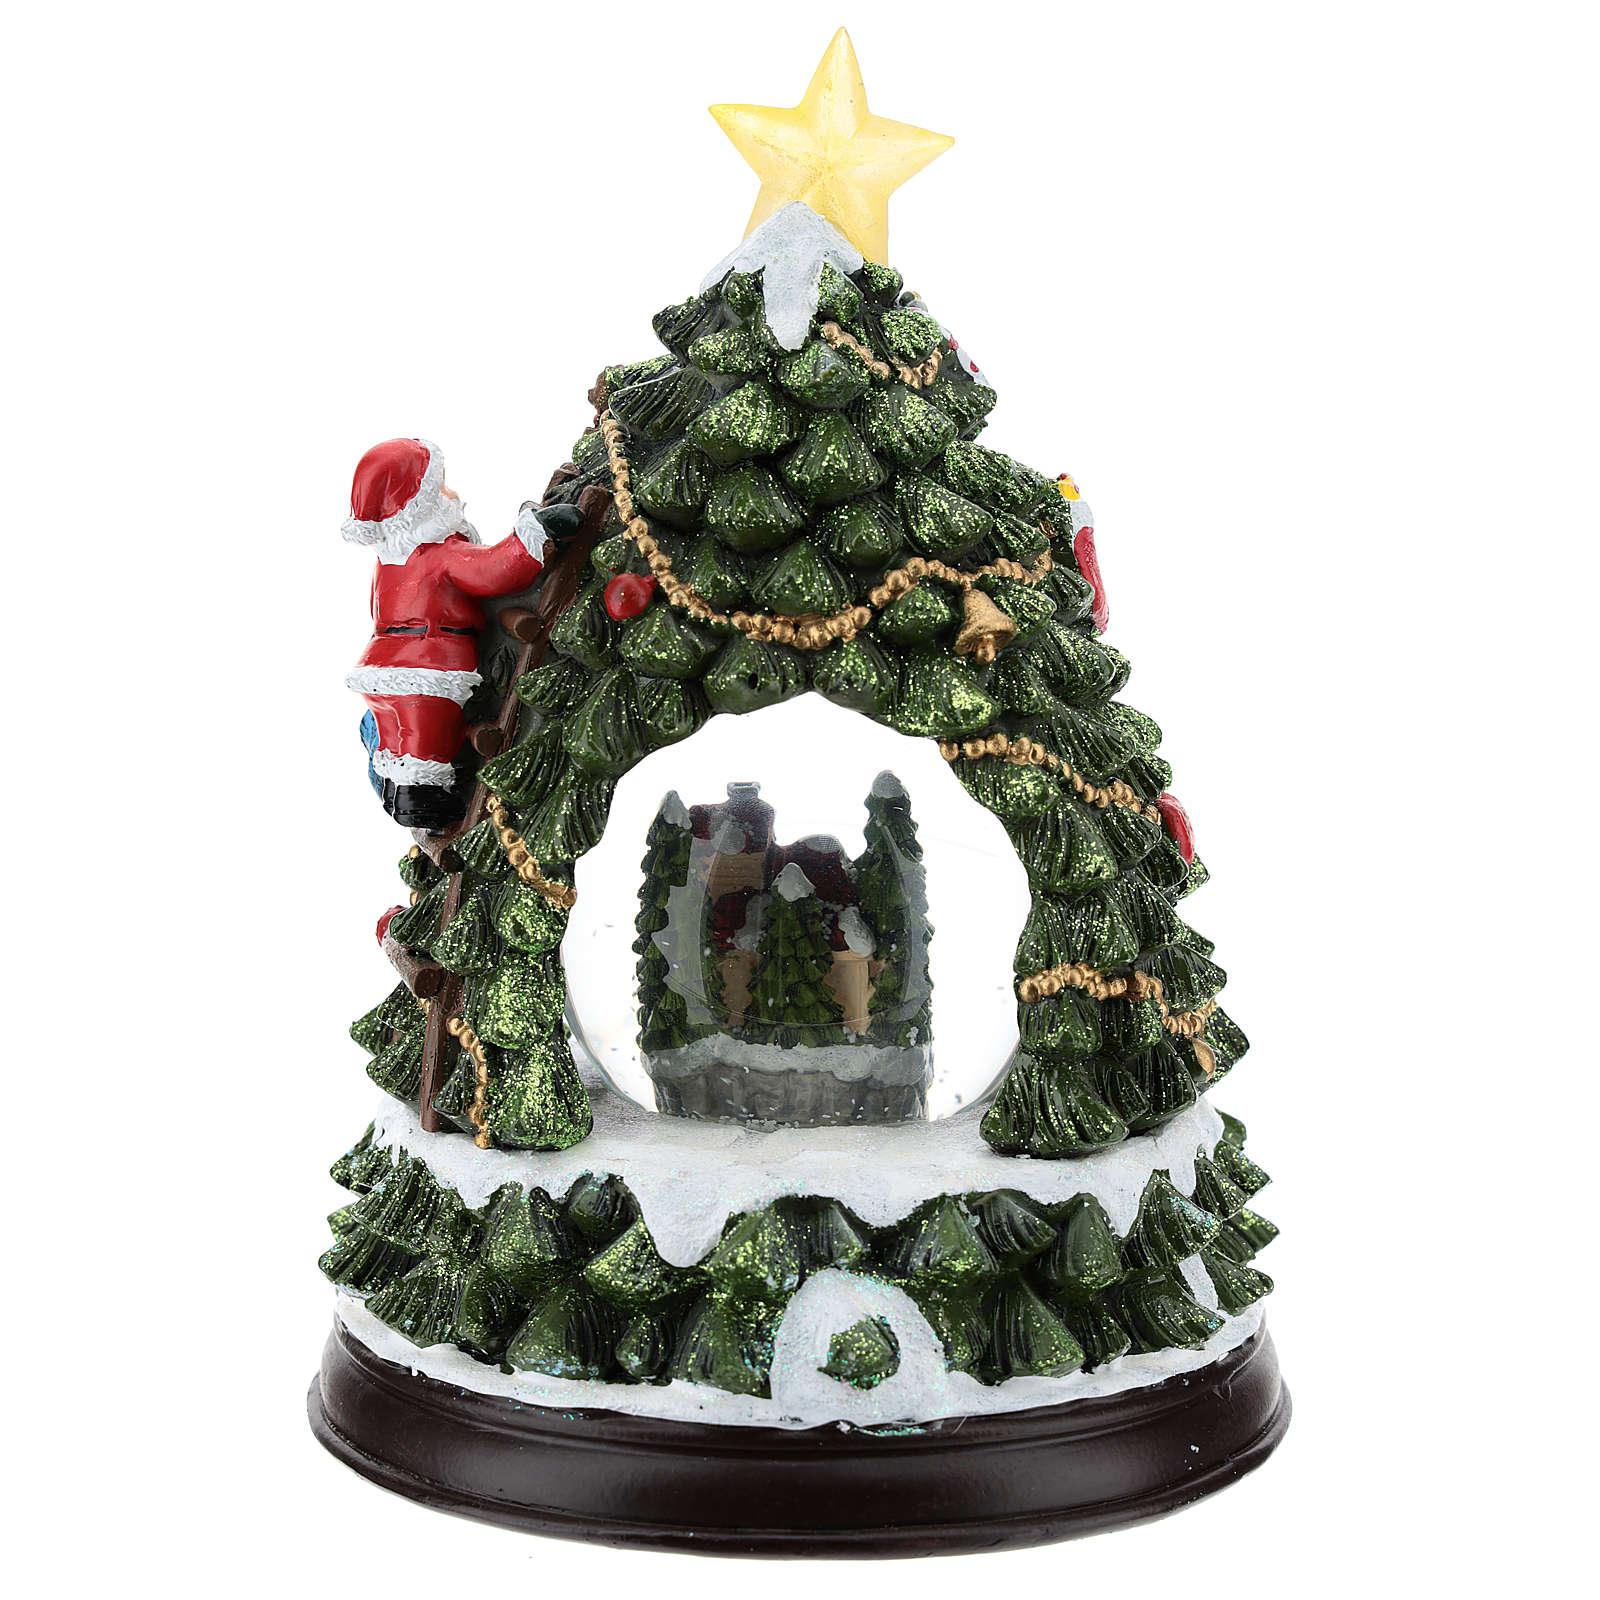 Albero Di Natale Con Foto.Albero Di Natale Con Palla Di Vetro H 25 Cm Vendita Online Su Holyart